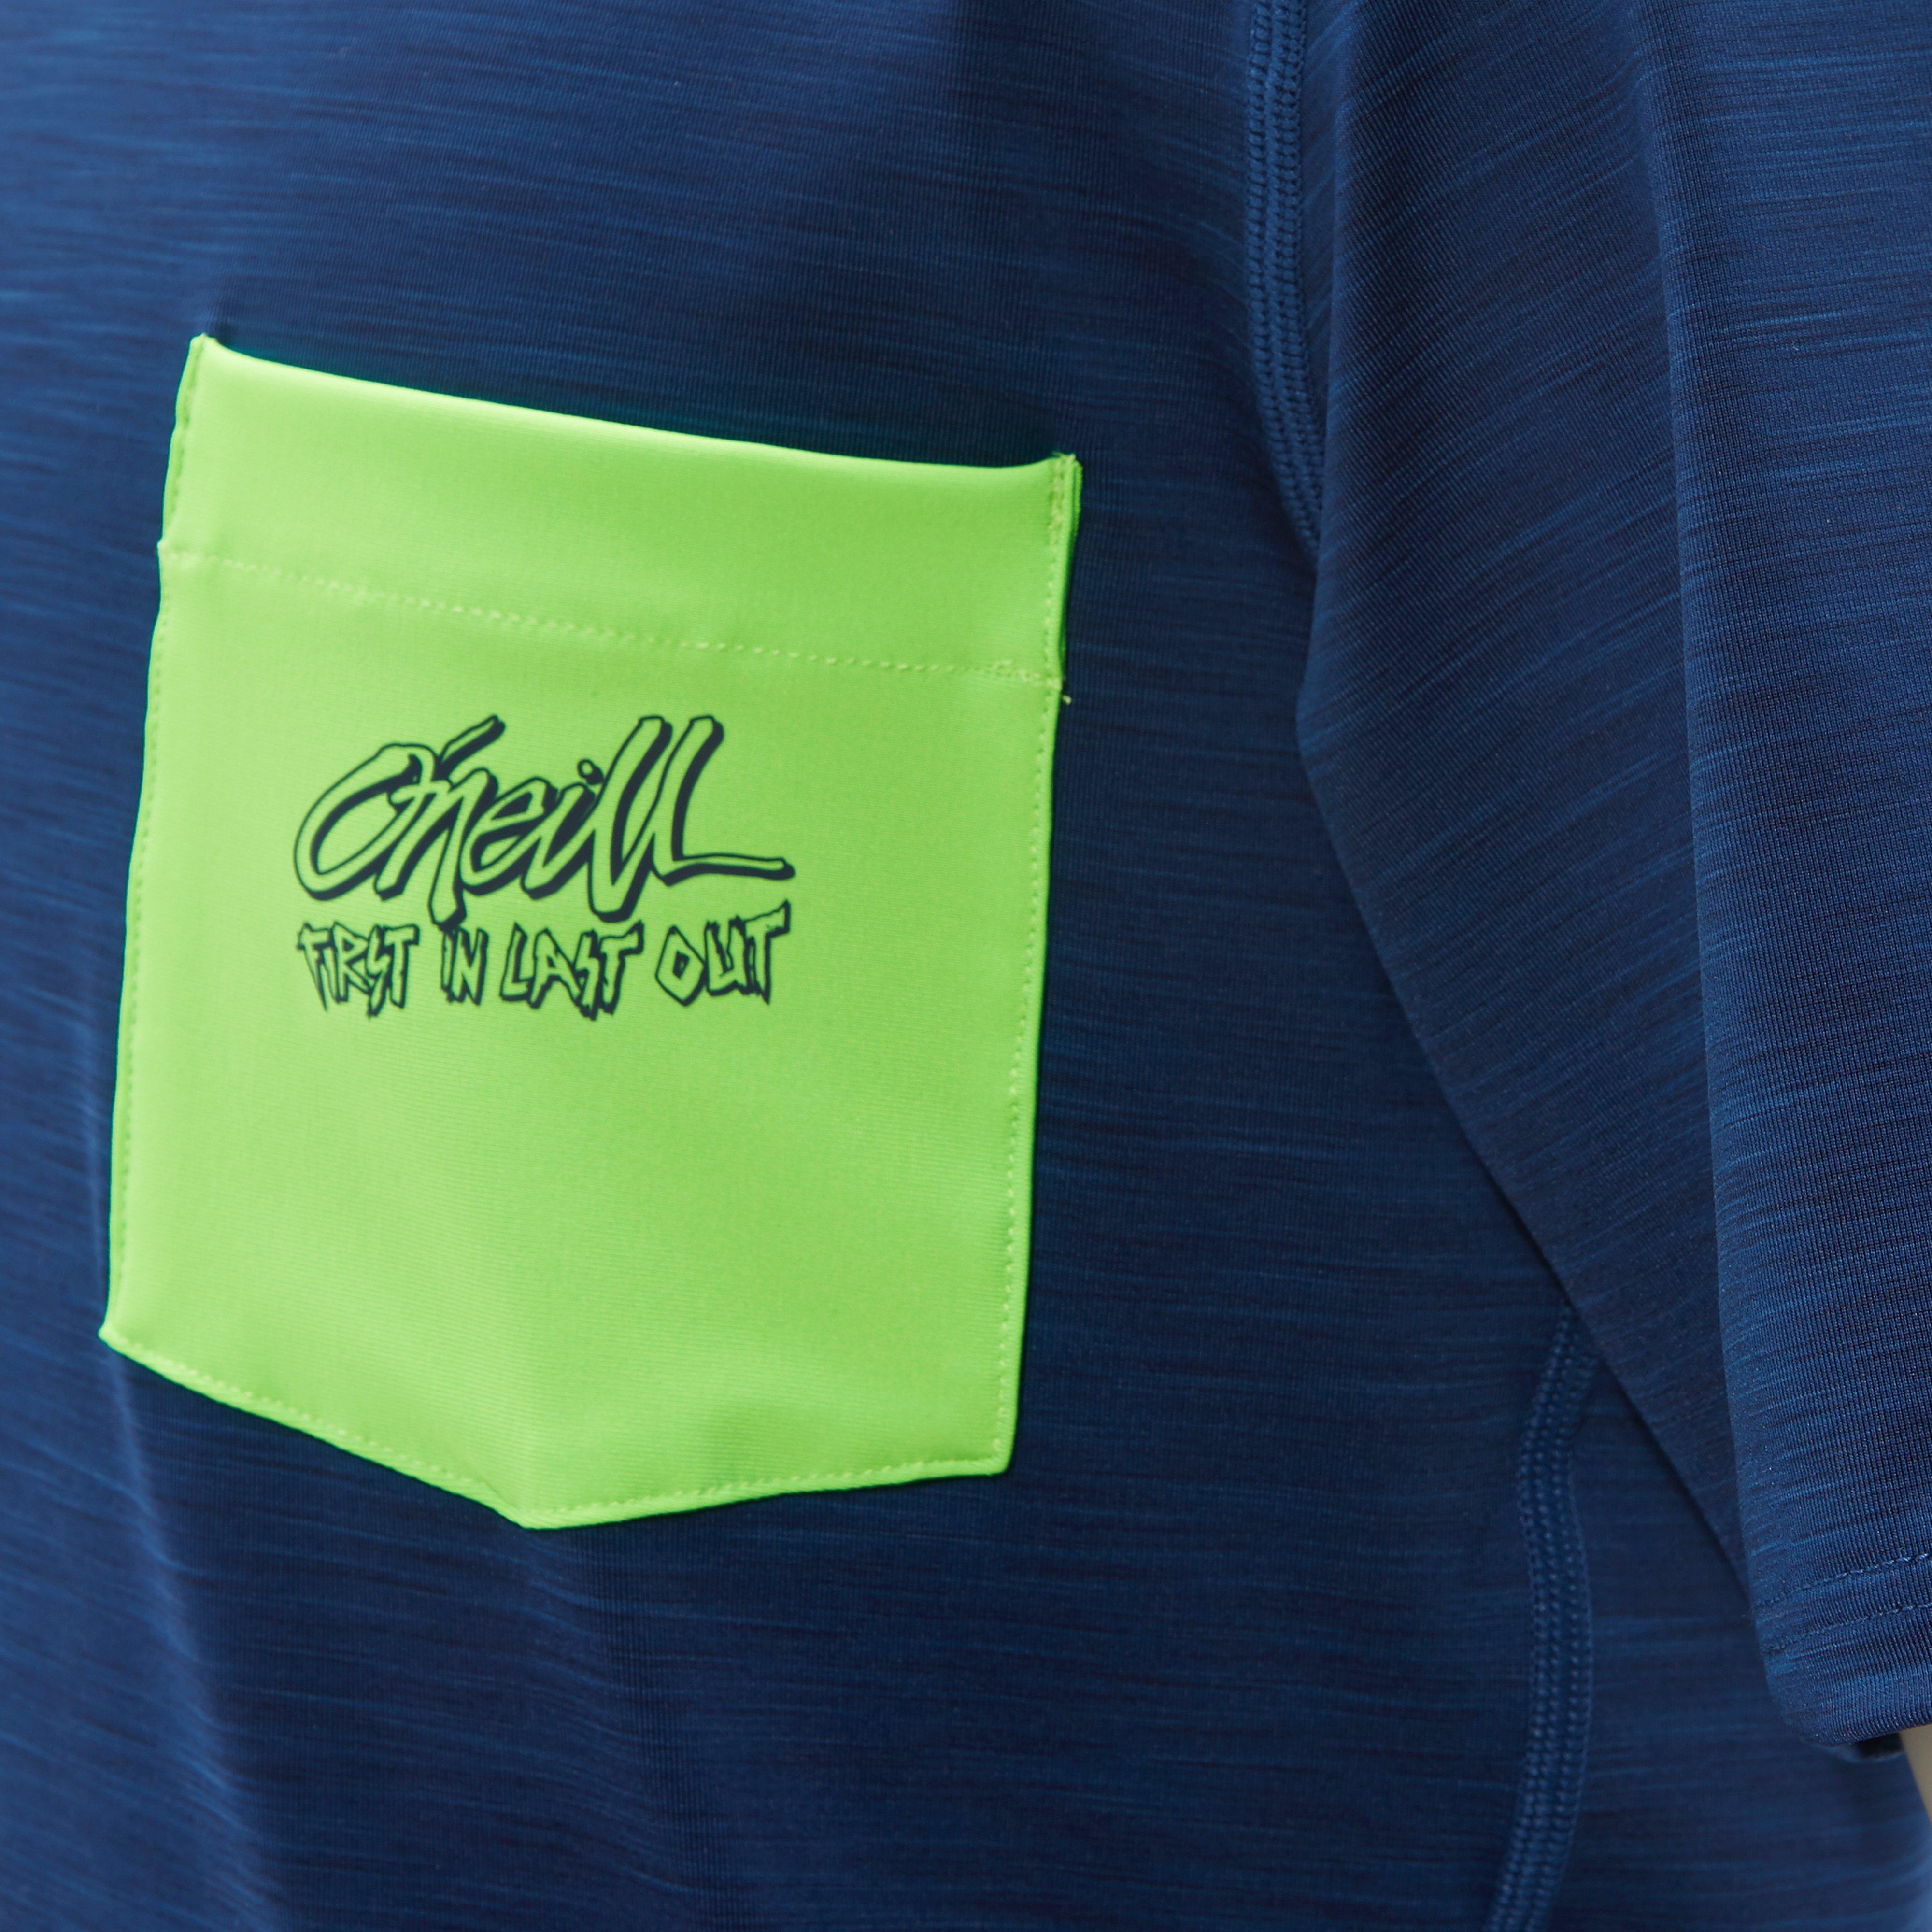 O'NEILL POCKET SURF SHORT SLEEVE SKIN SHIRT BLAUW KINDEREN